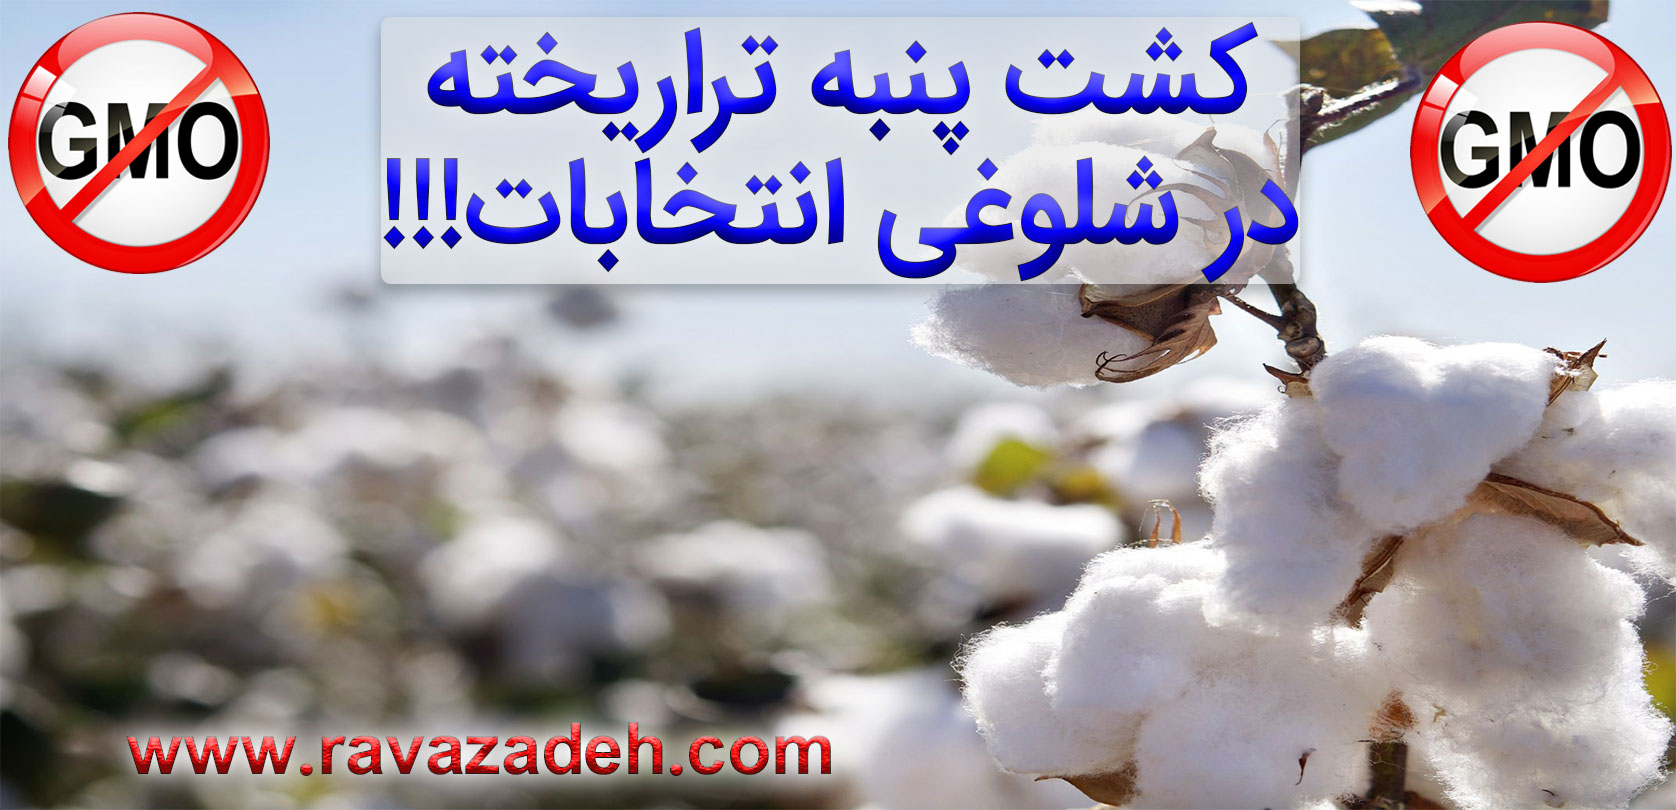 Photo of یک خیانت دیگر به سلامت و کشاورزی ایران در شلوغی انتخابات